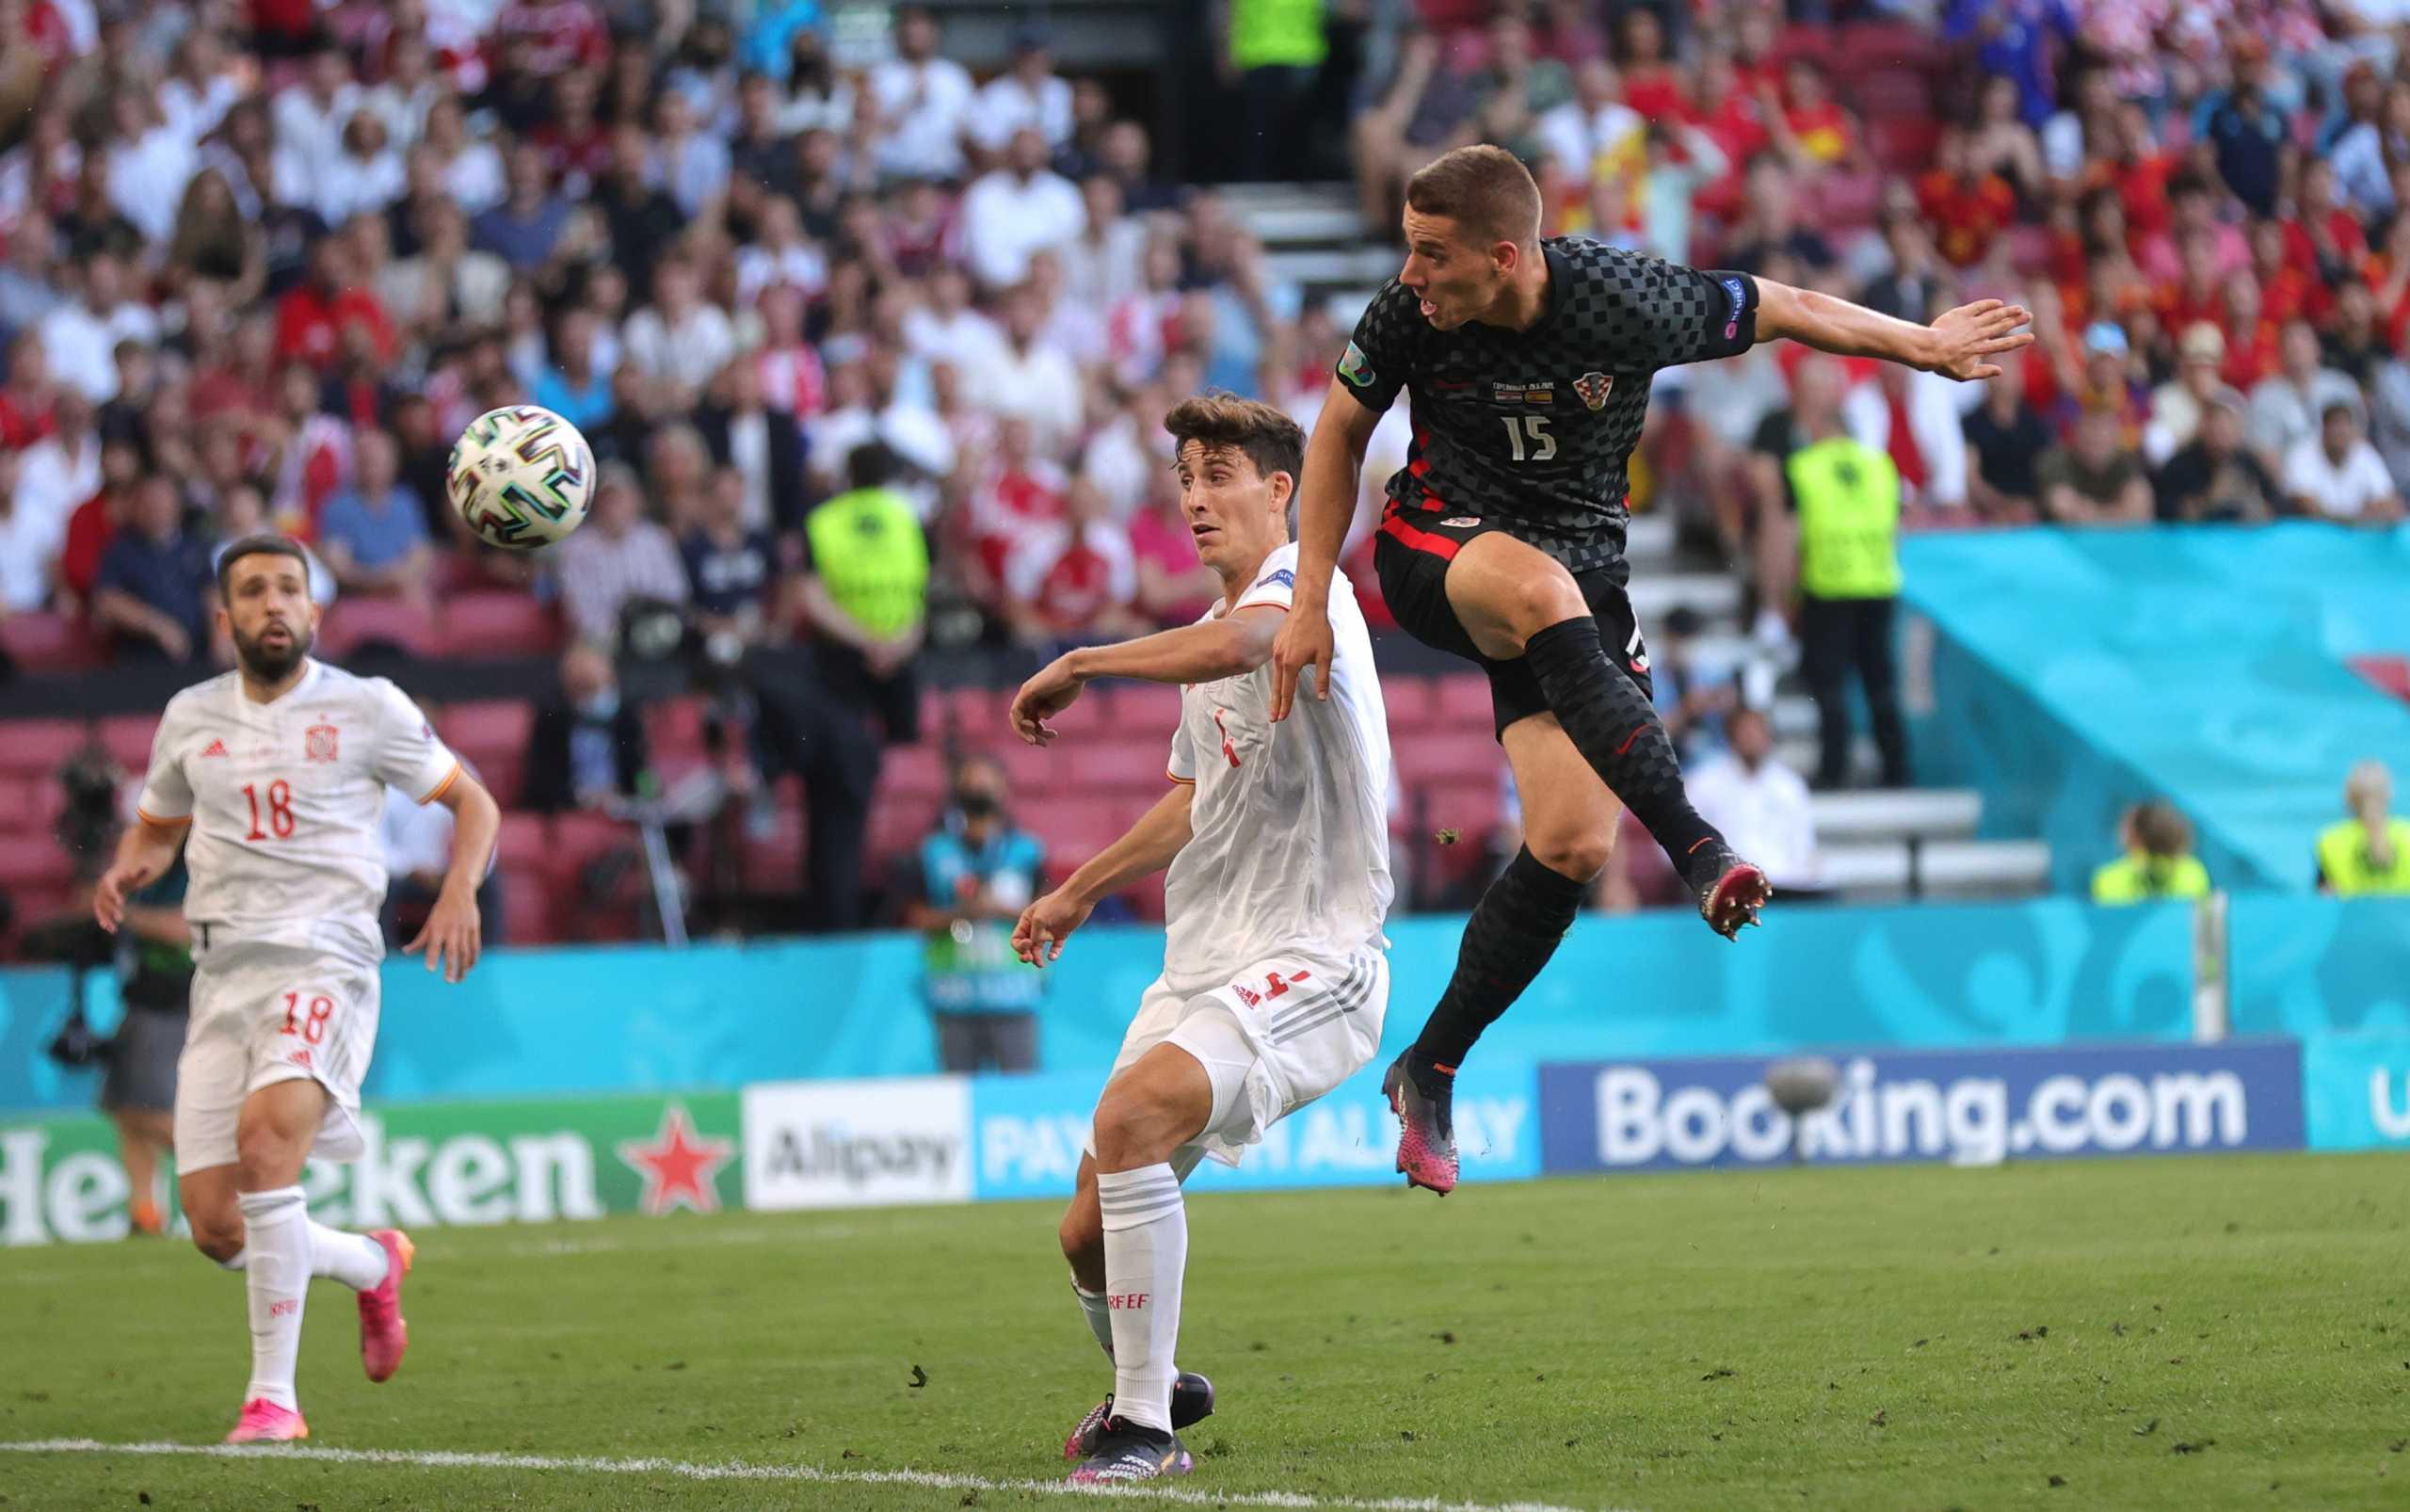 Euro 2020, Κροατία – Ισπανία: Ο Πάσαλιτς το έστειλε στην παράταση